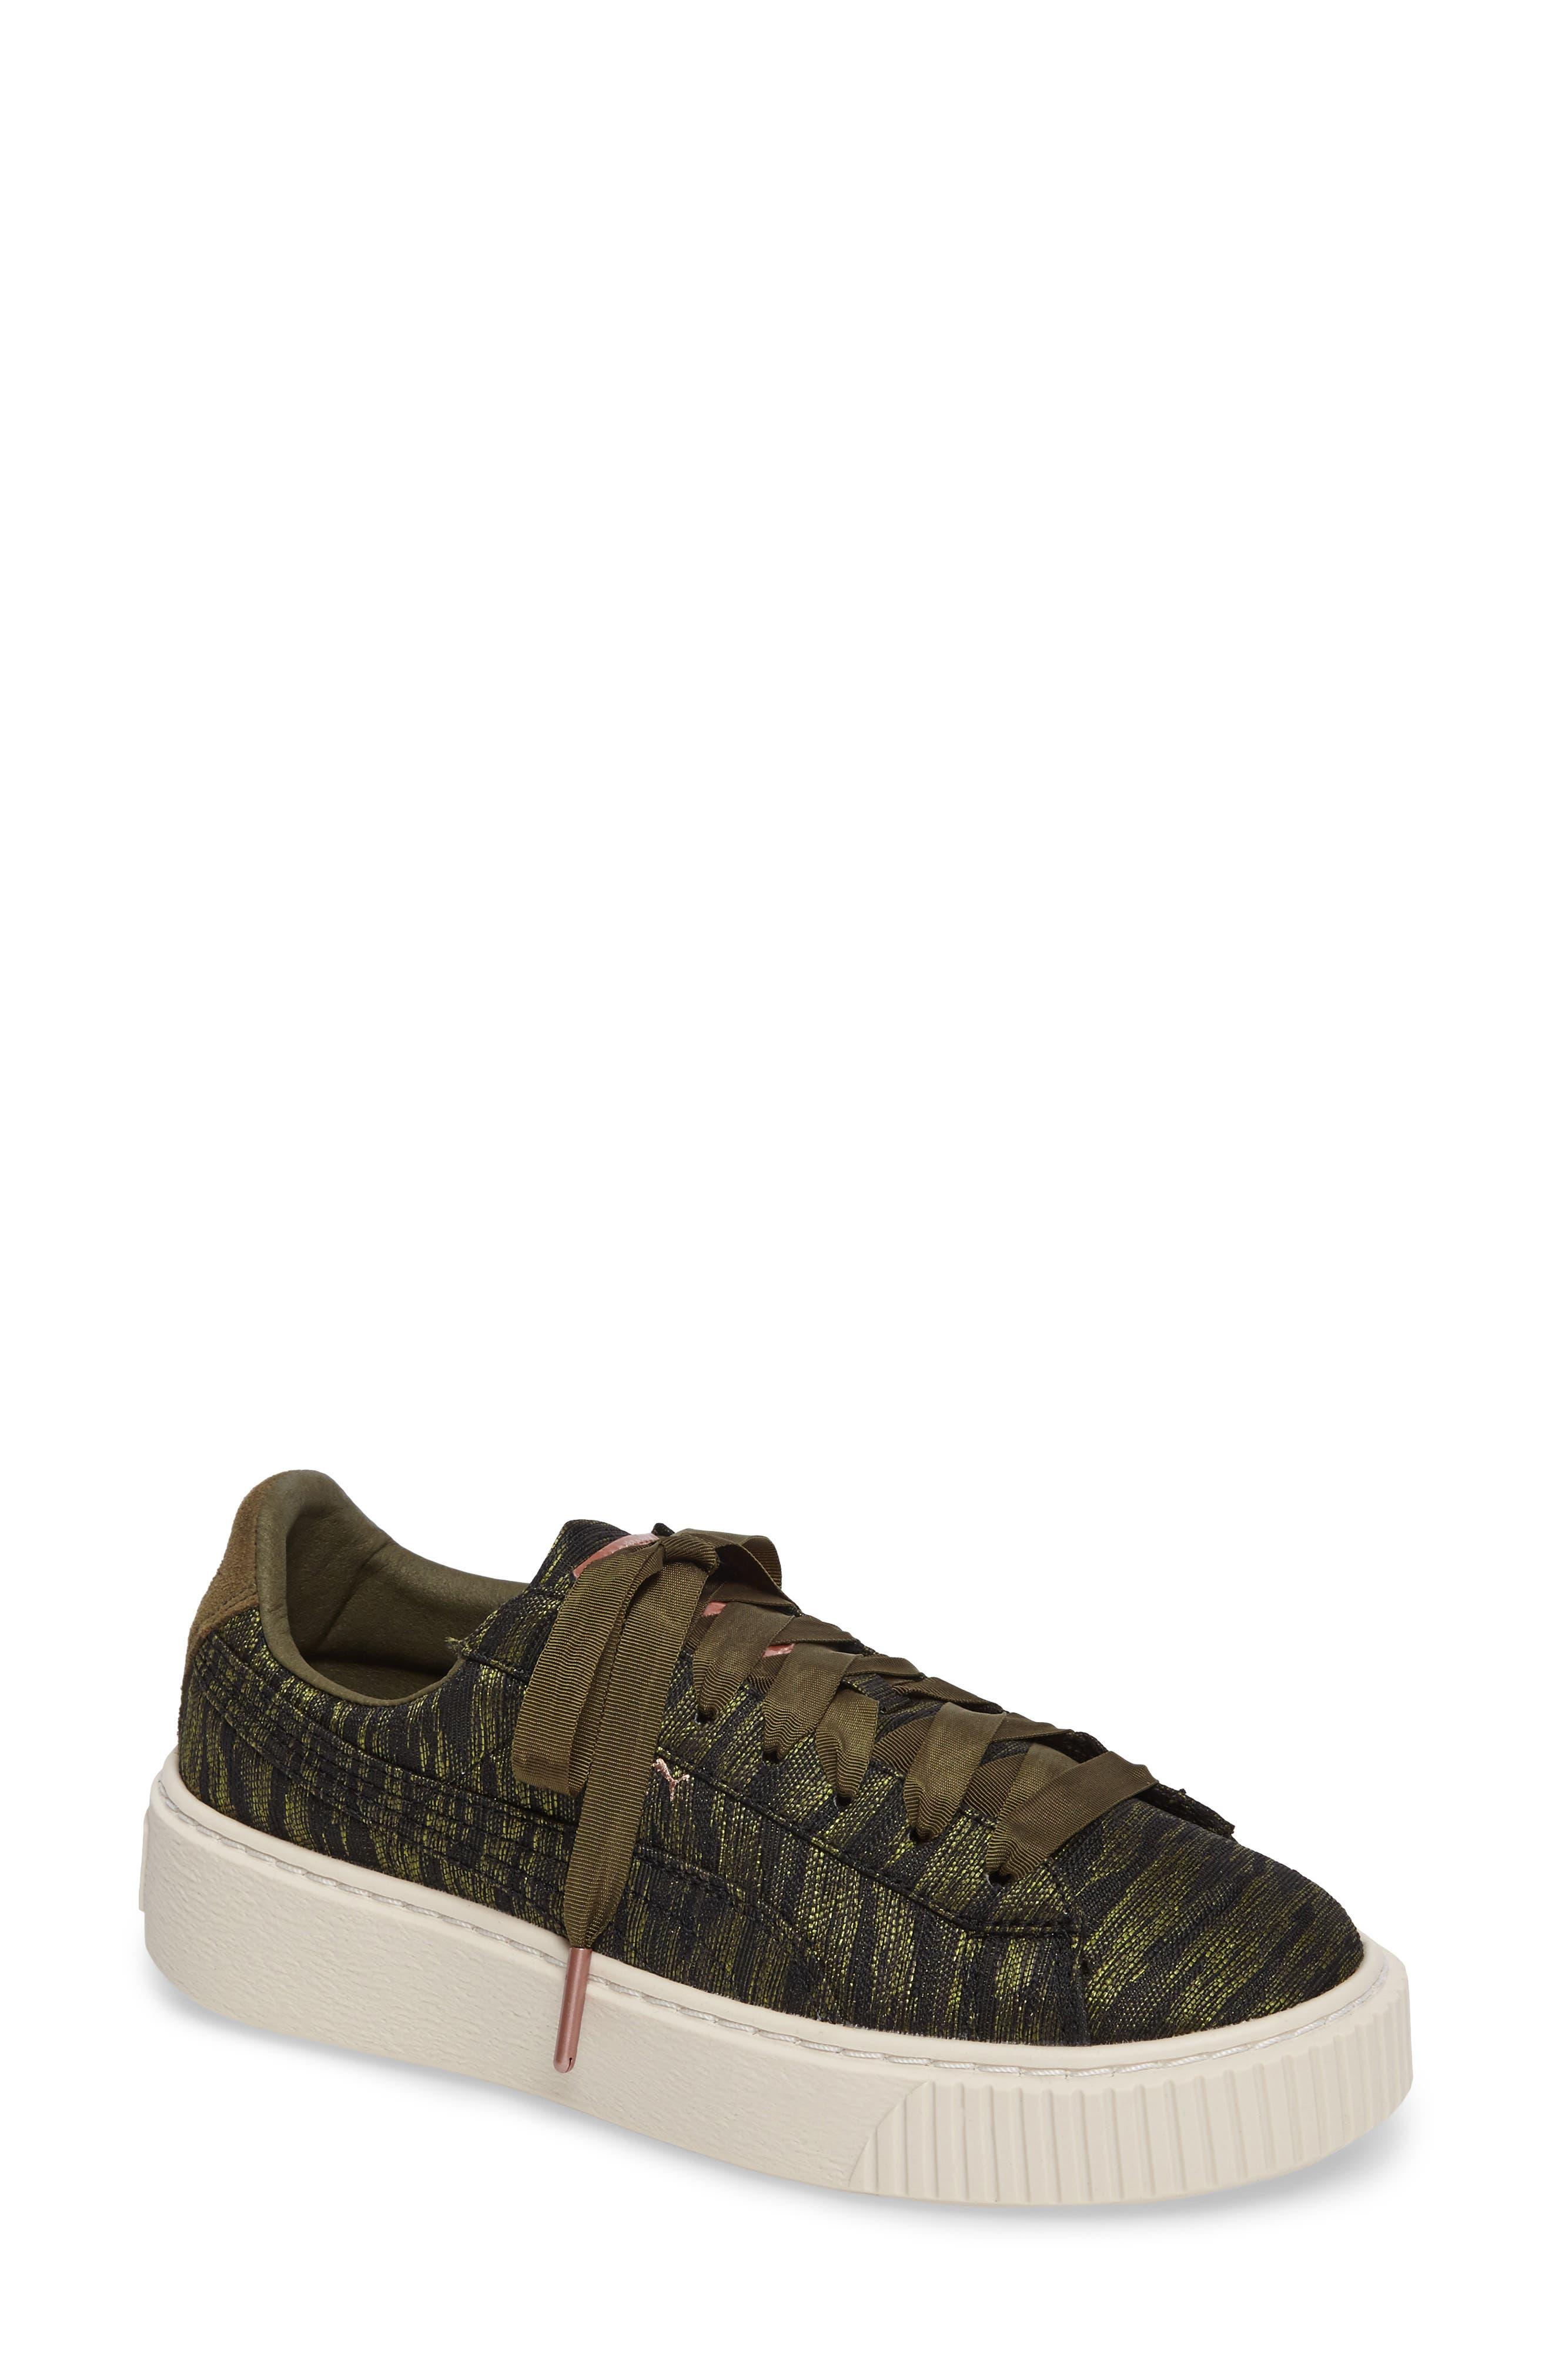 Main Image - PUMA Basket Platform Sneaker (Women)